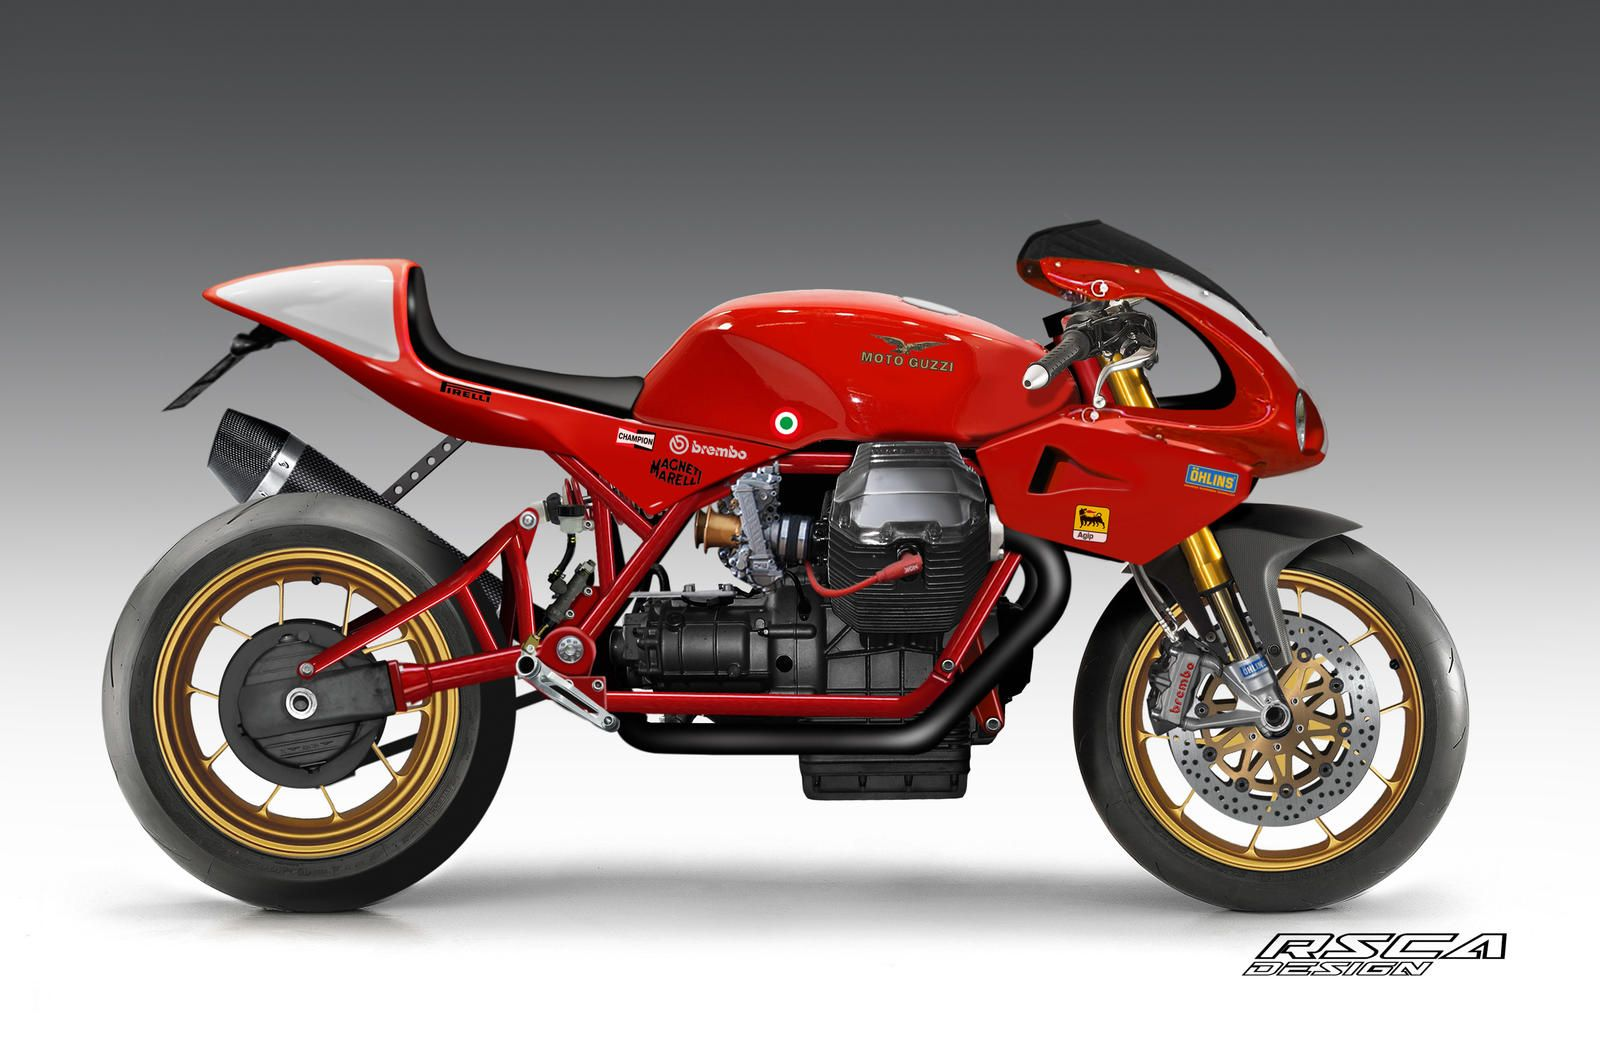 Moto Guzzi By Rsca3215 On Deviantart In 2021 Cafe Racer Moto Moto Guzzi Cafe Racer Moto Guzzi Motorcycles